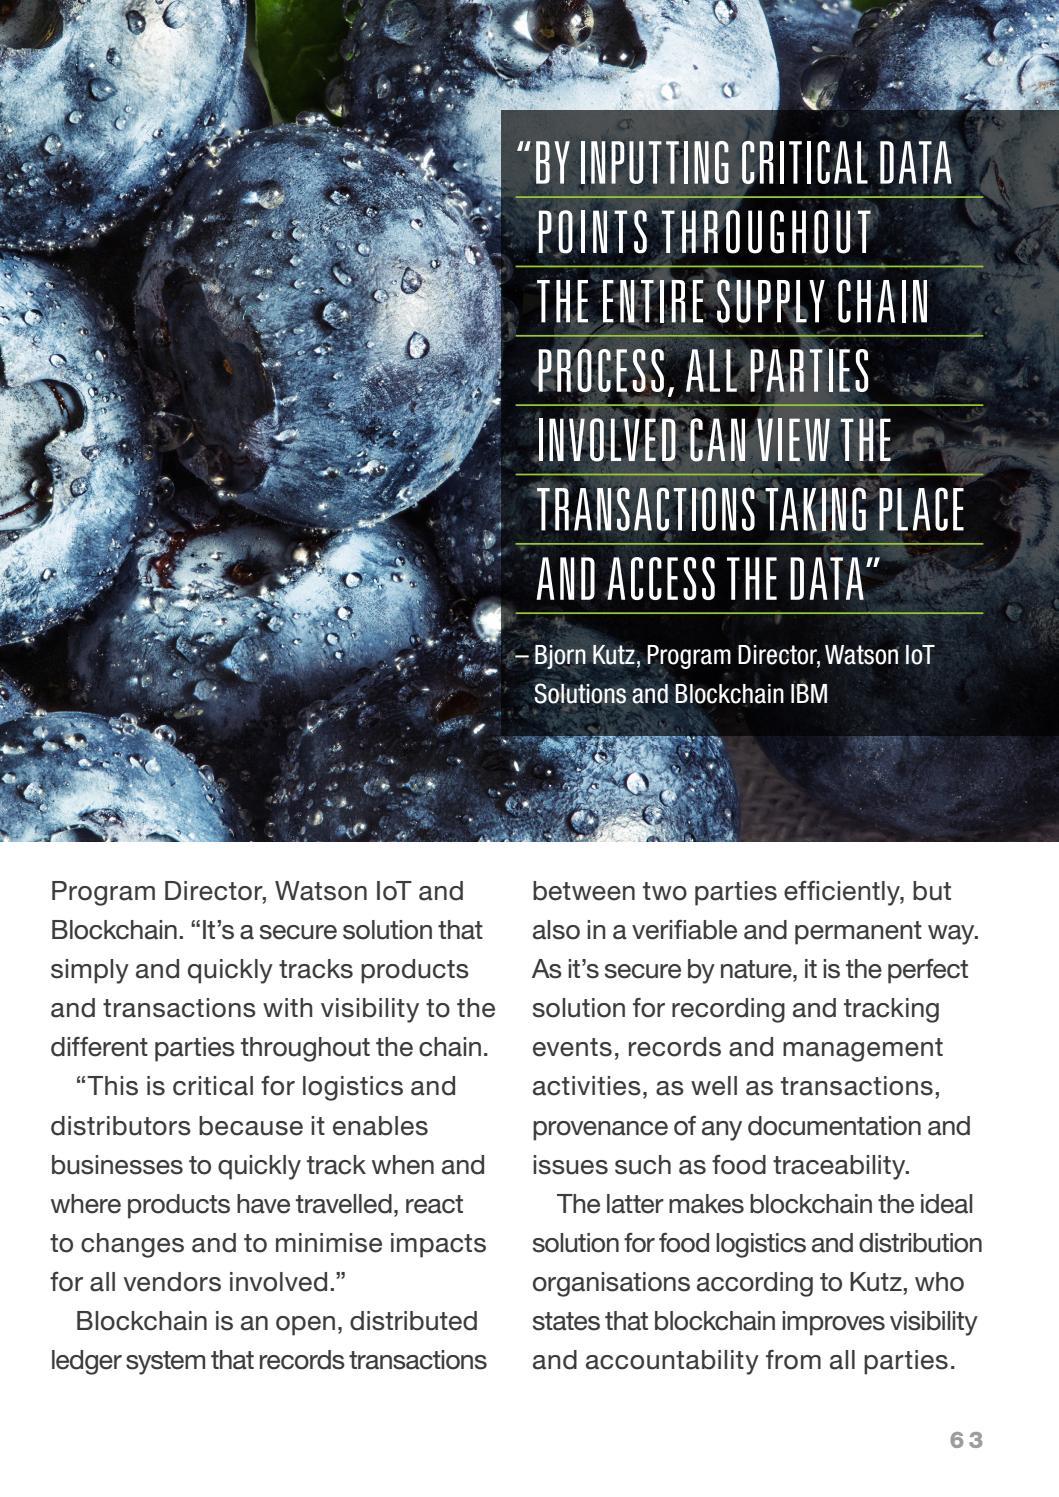 Supply Chain Magazine — May 2018 by Supply Chain Digital - issuu